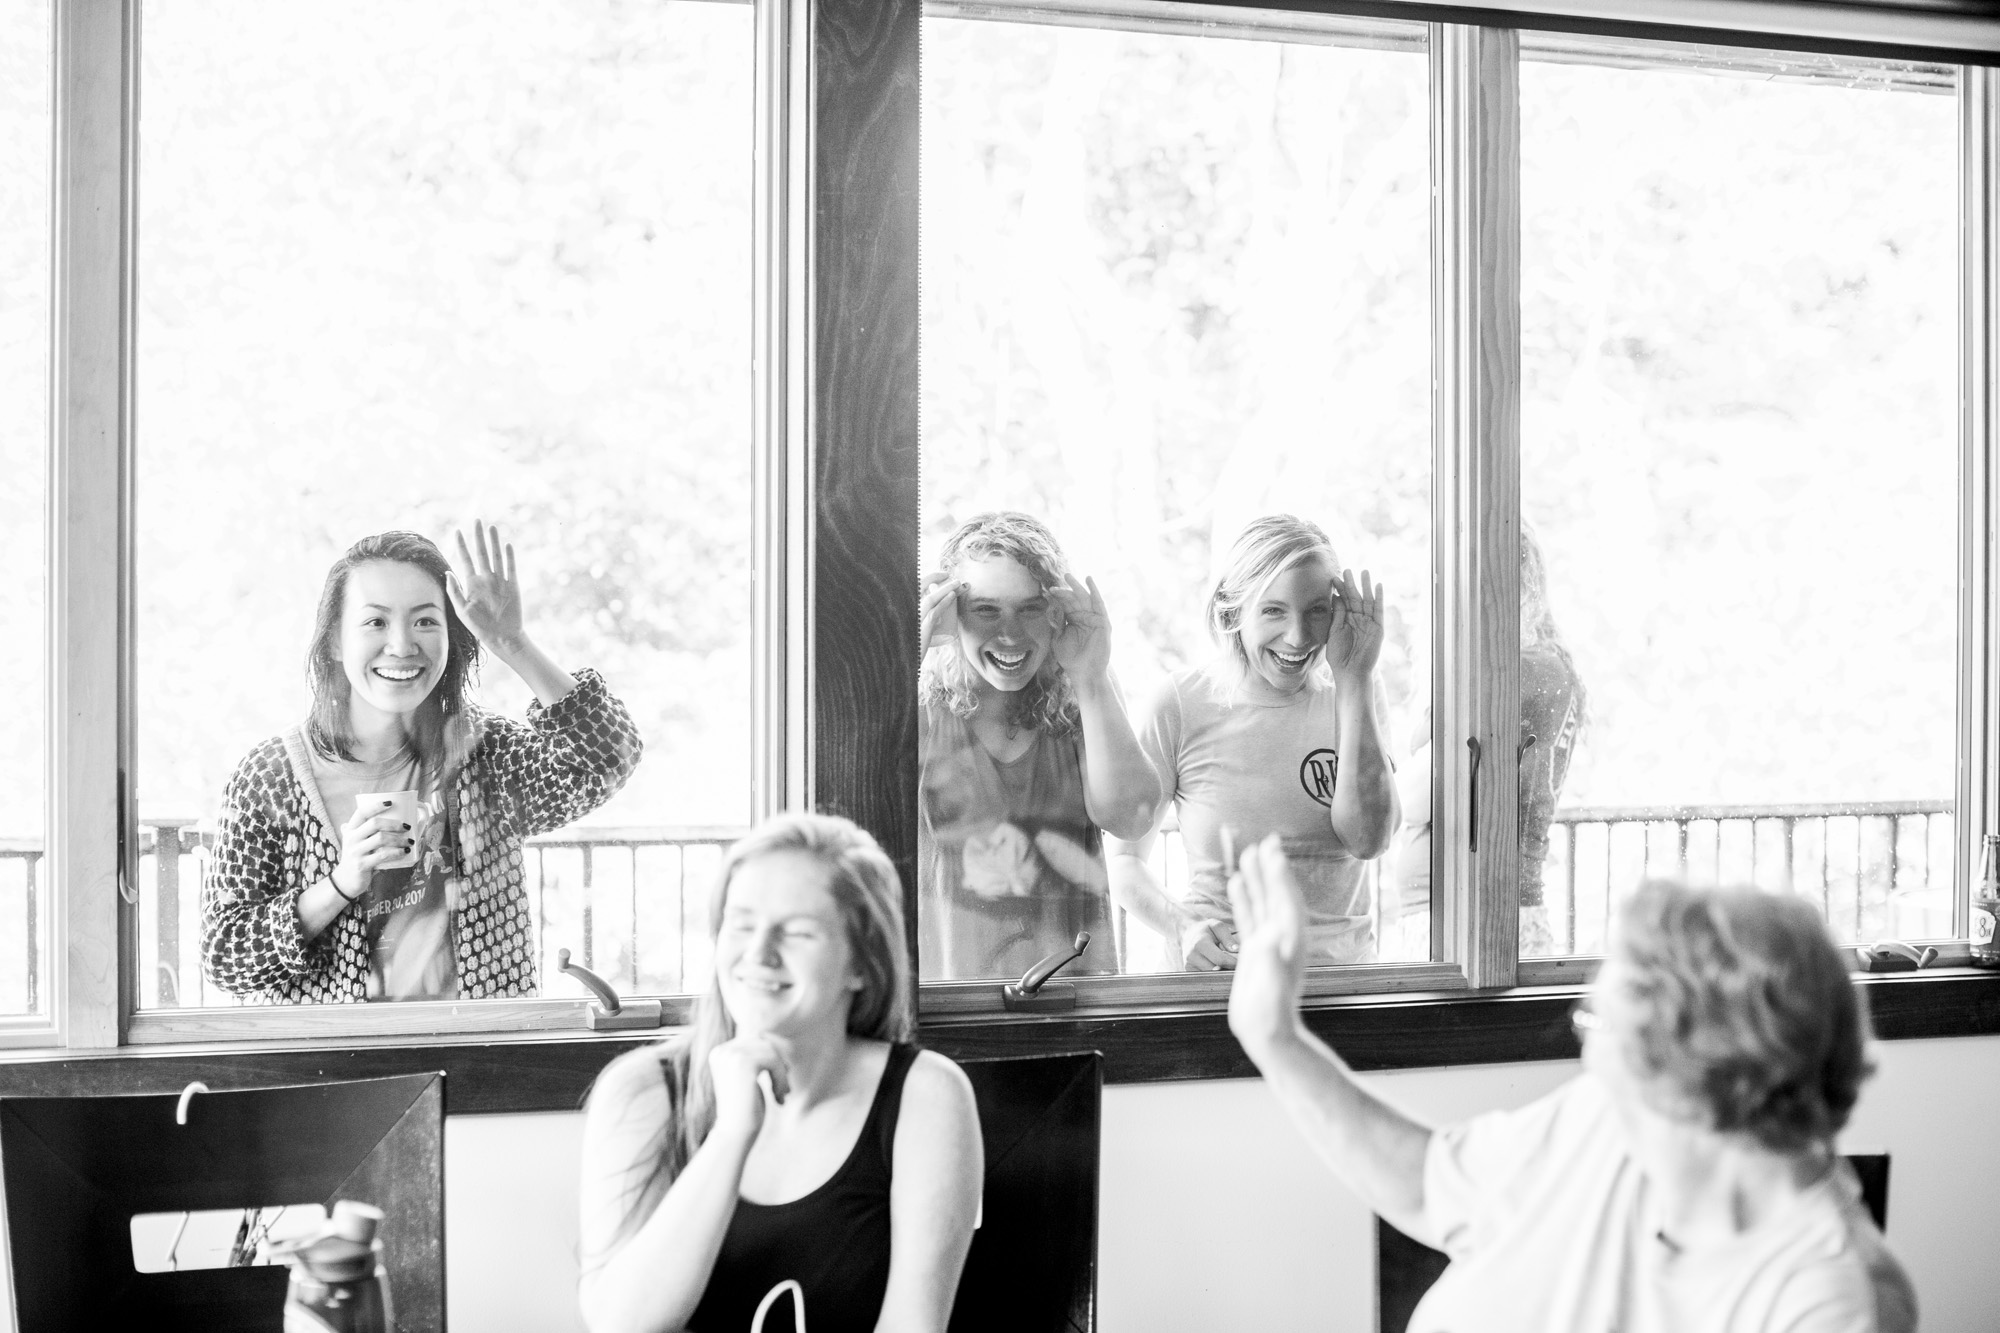 Seriously_Sabrina_Photography_Red_River_Gorge_Kentucky_Wedding_ShawnDana20.jpg